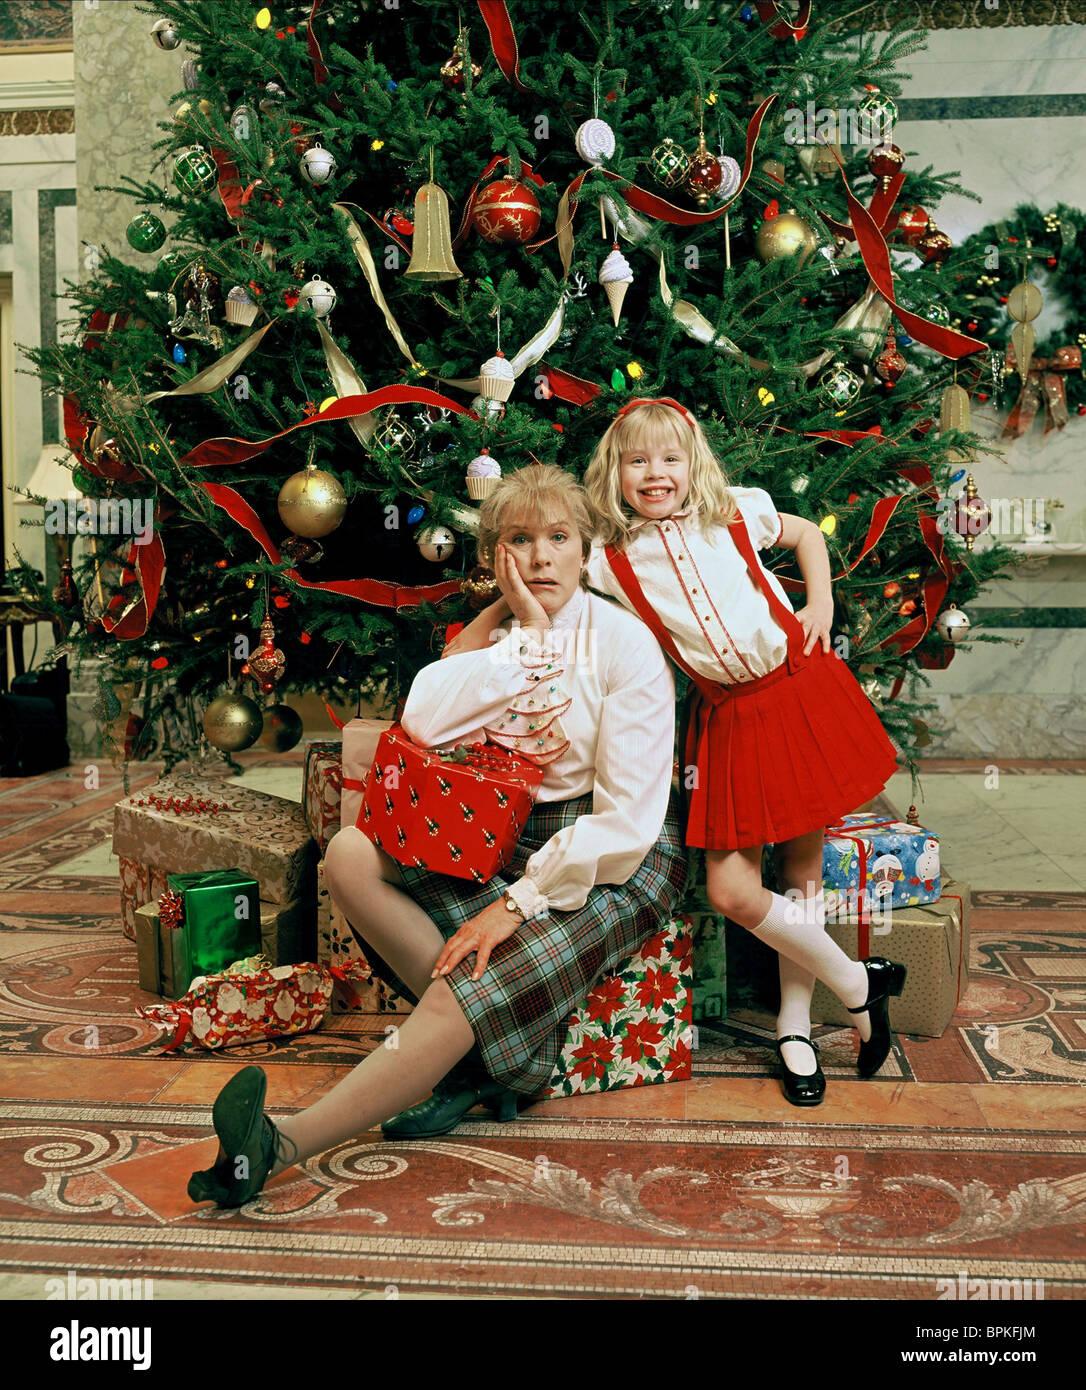 Eloise At Christmastime.Julie Andrews Sofia Vassilieva Eloise At Christmastime